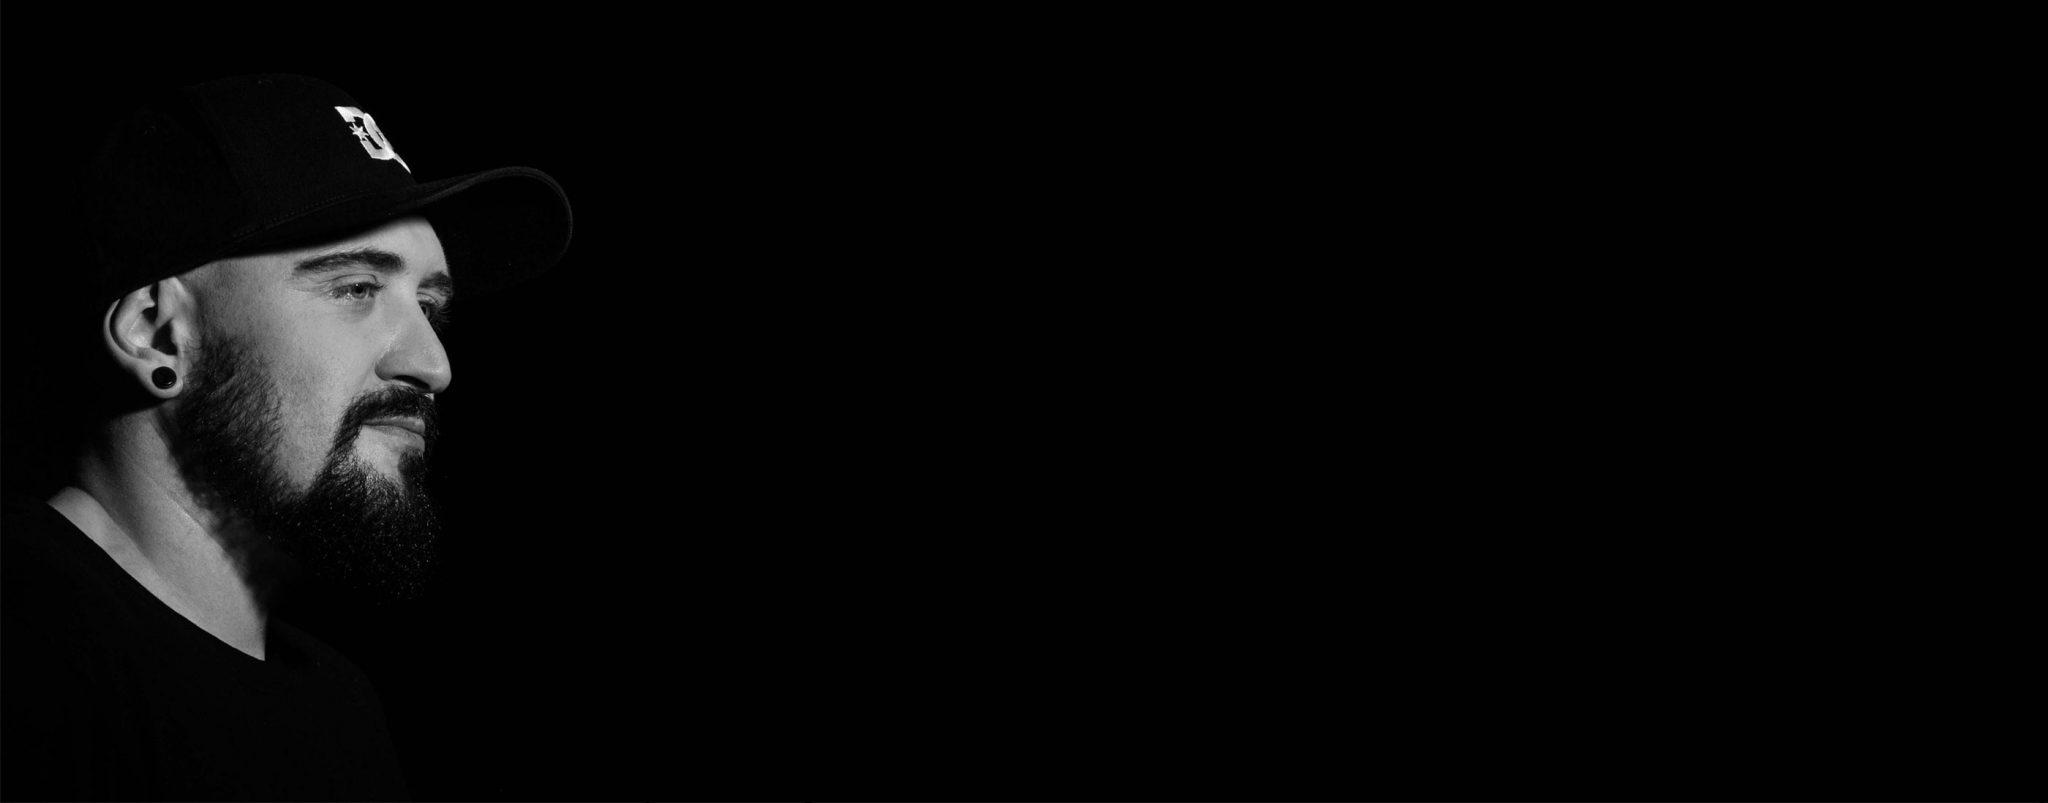 Luis Martinez, Ben Teufel - Mind Black EP hero